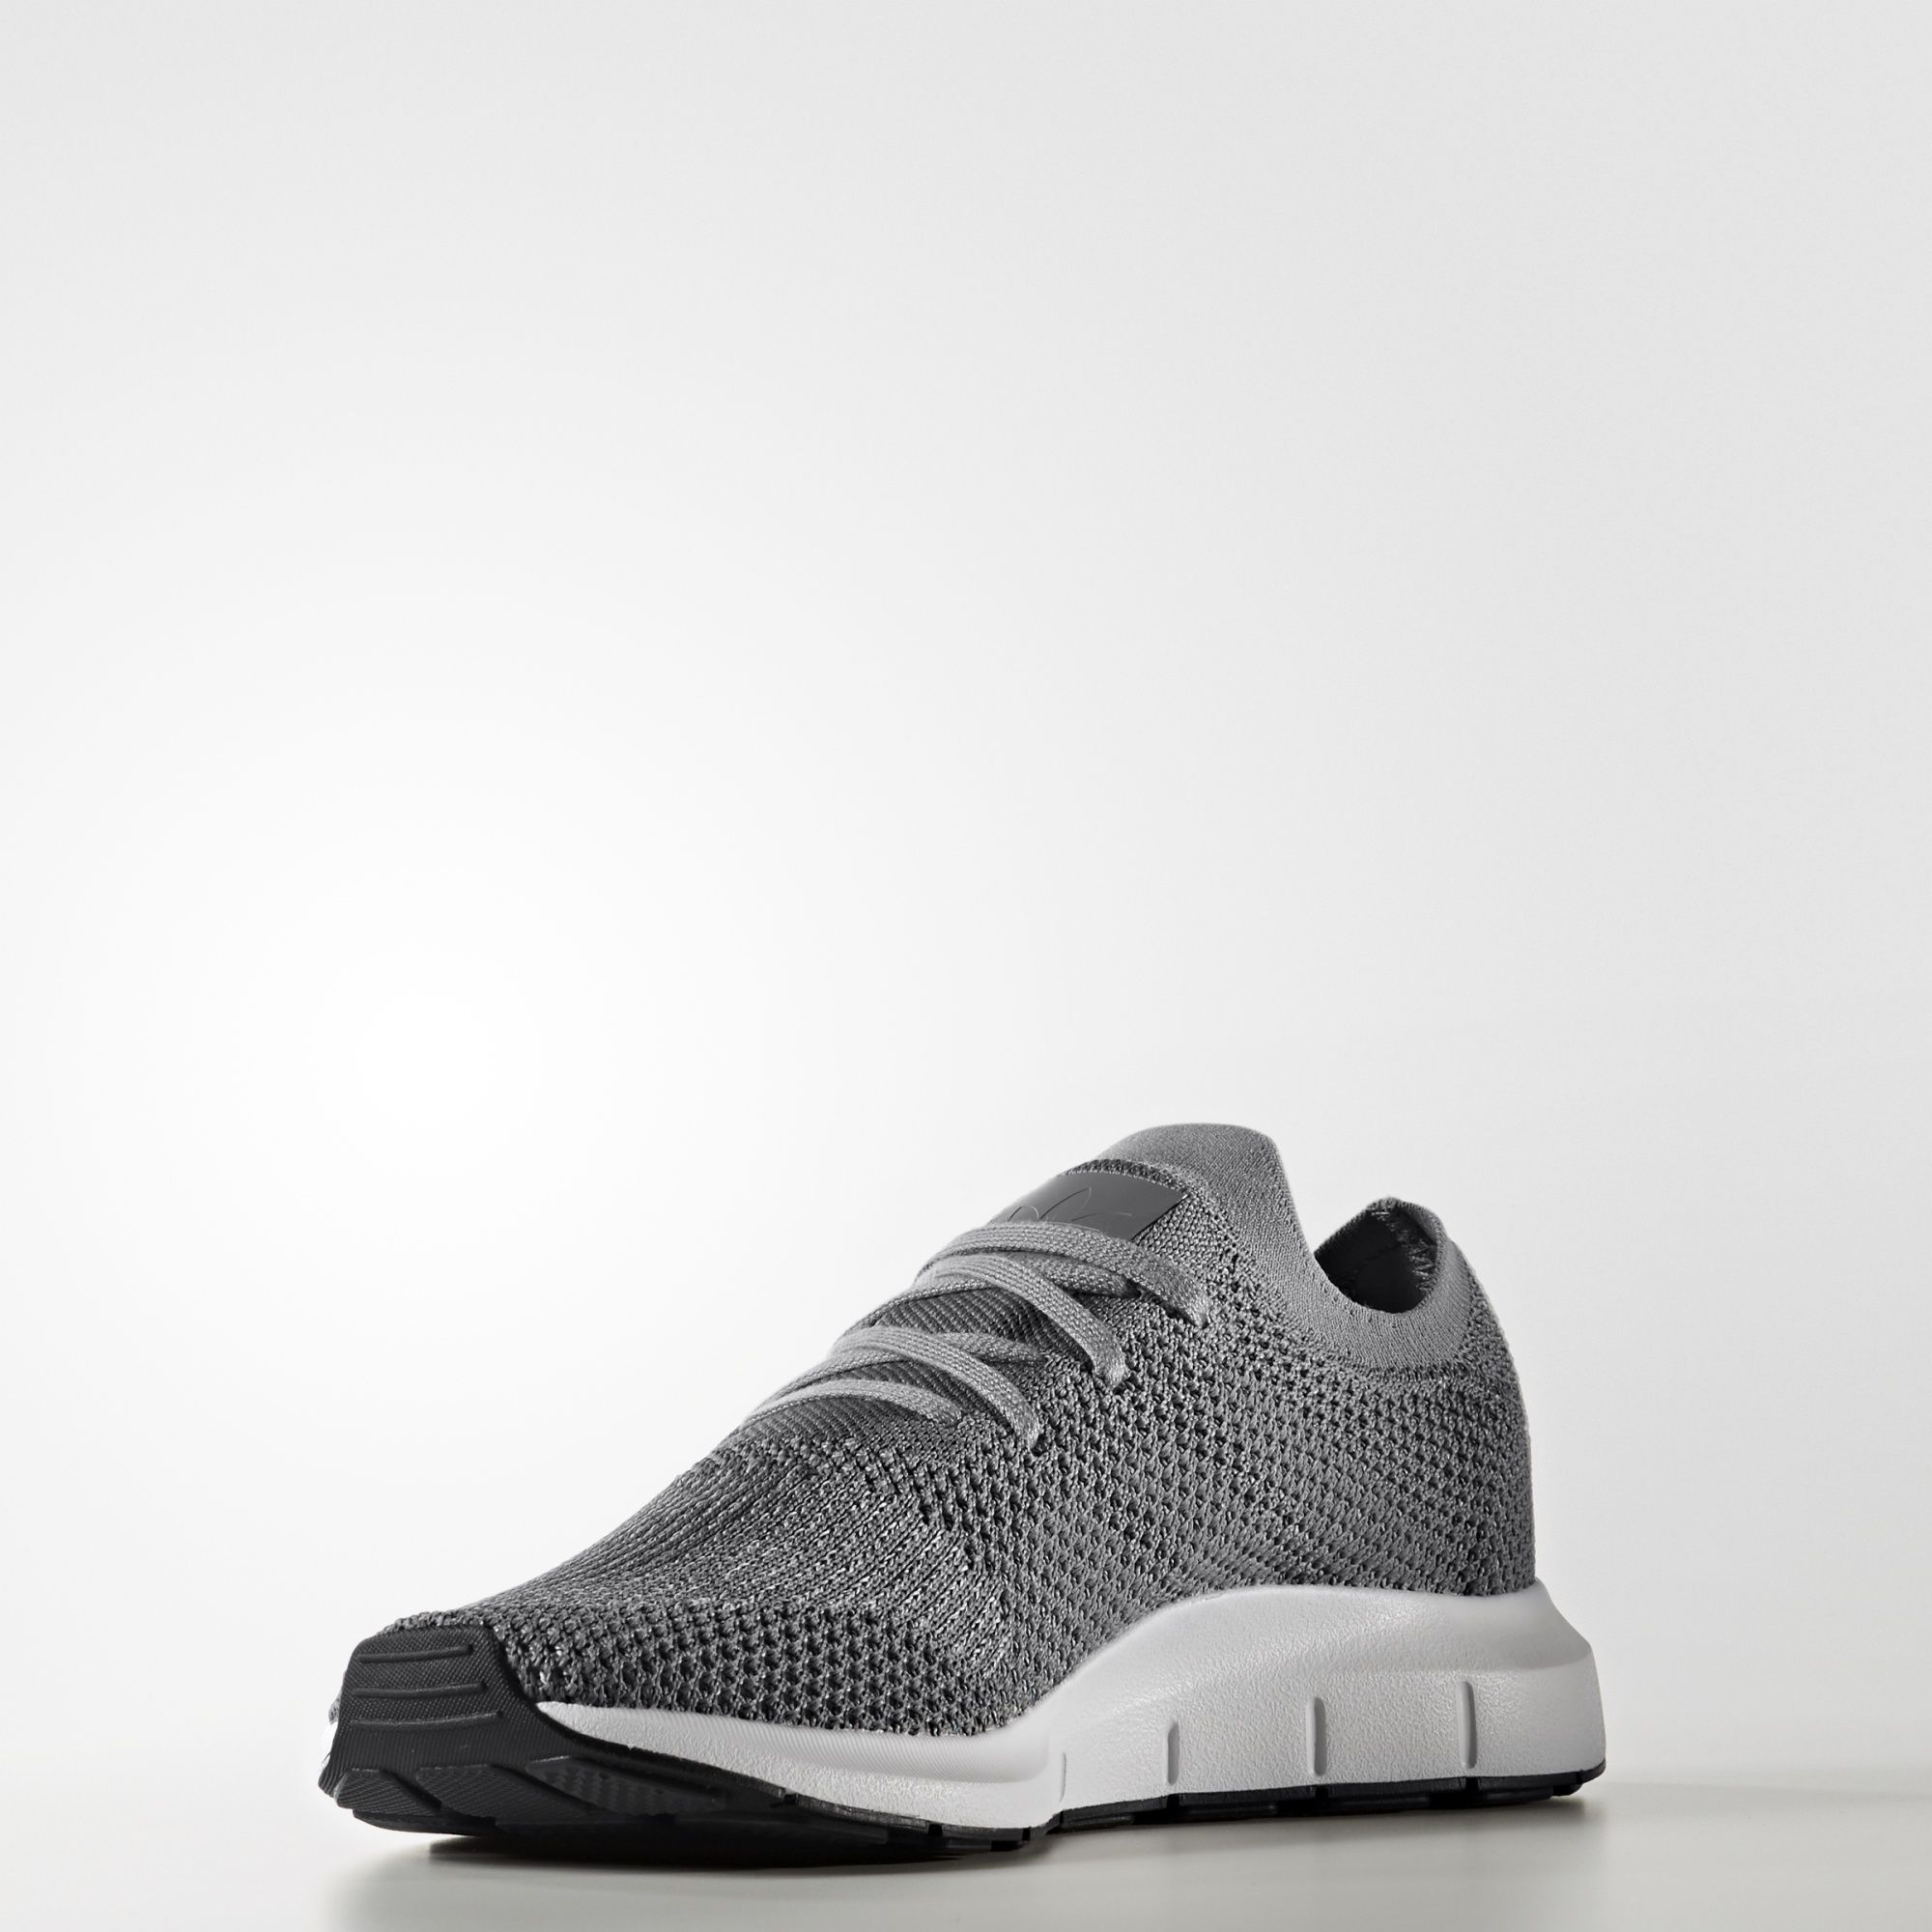 CG4128 adidas Swift Run Primeknit Grey 2